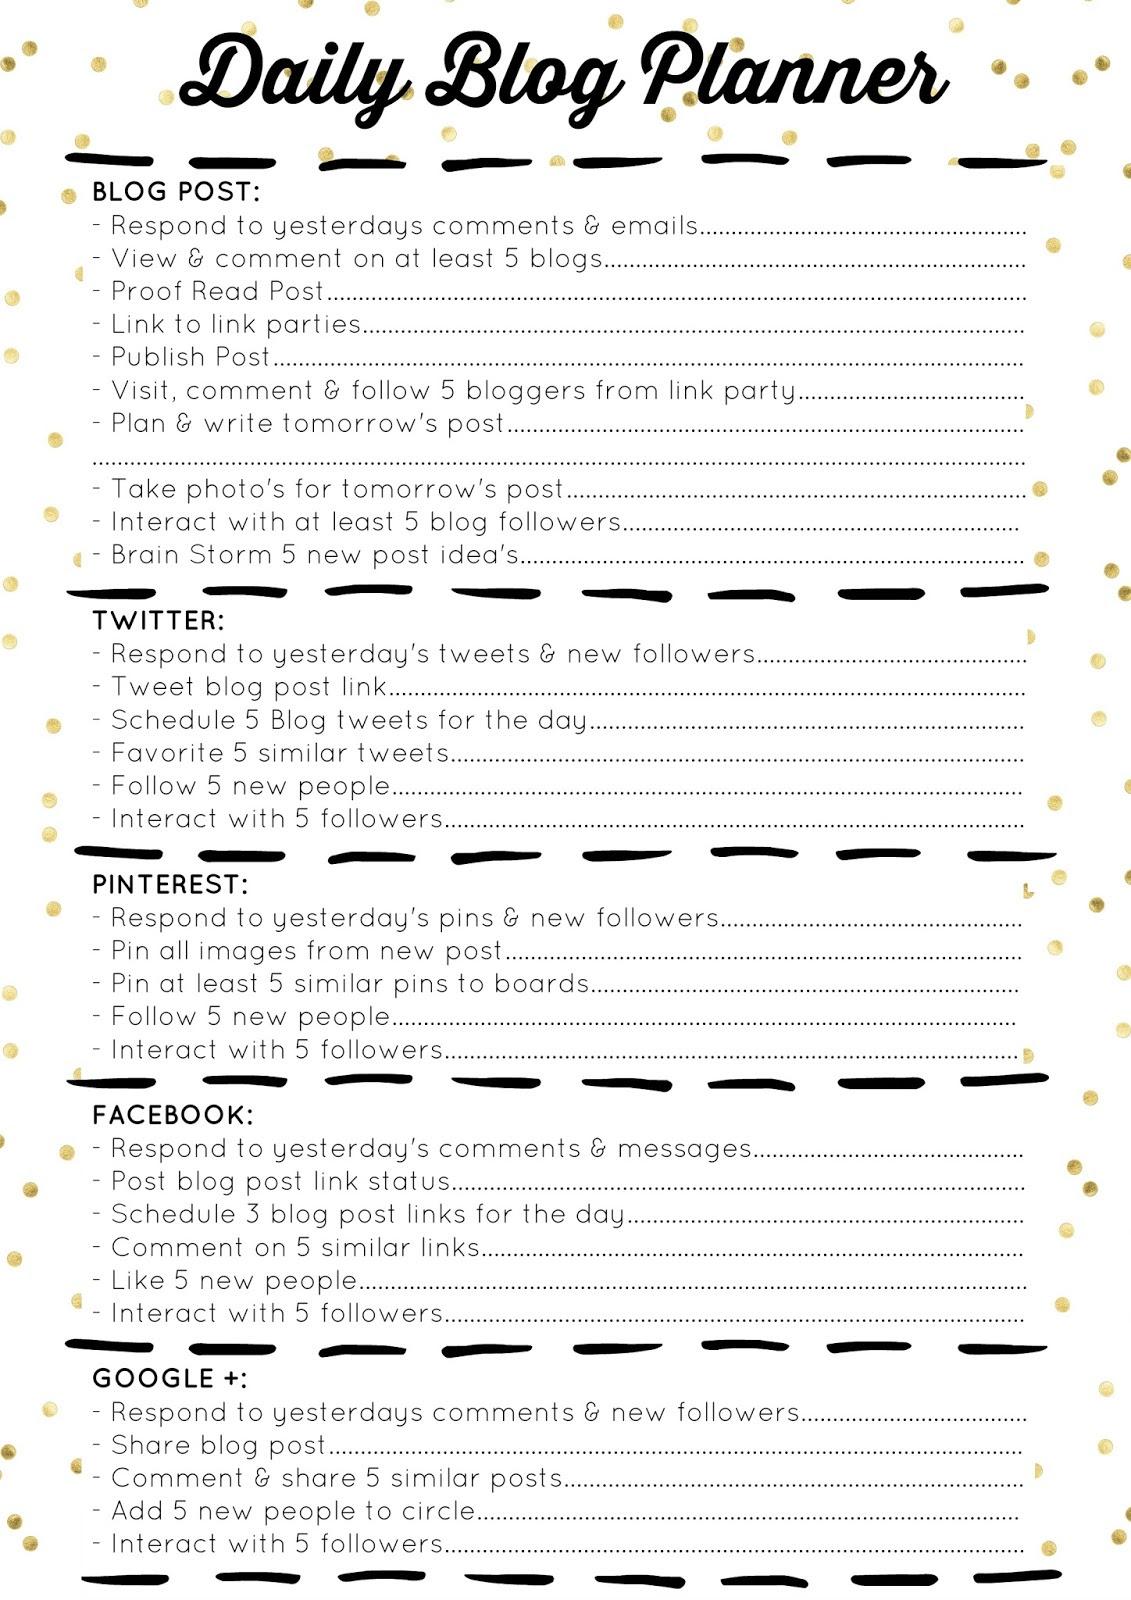 Free Printable Daily Blog Planner